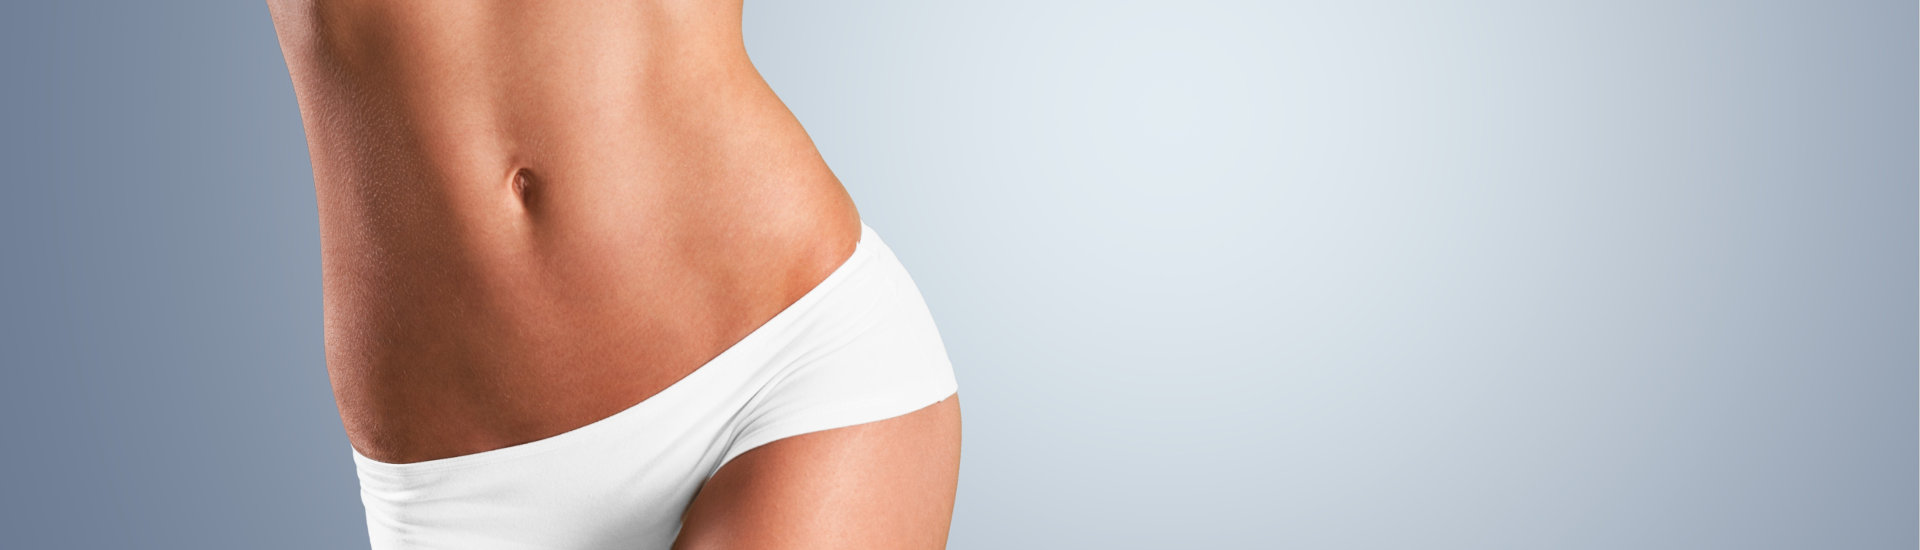 skin-tighttening